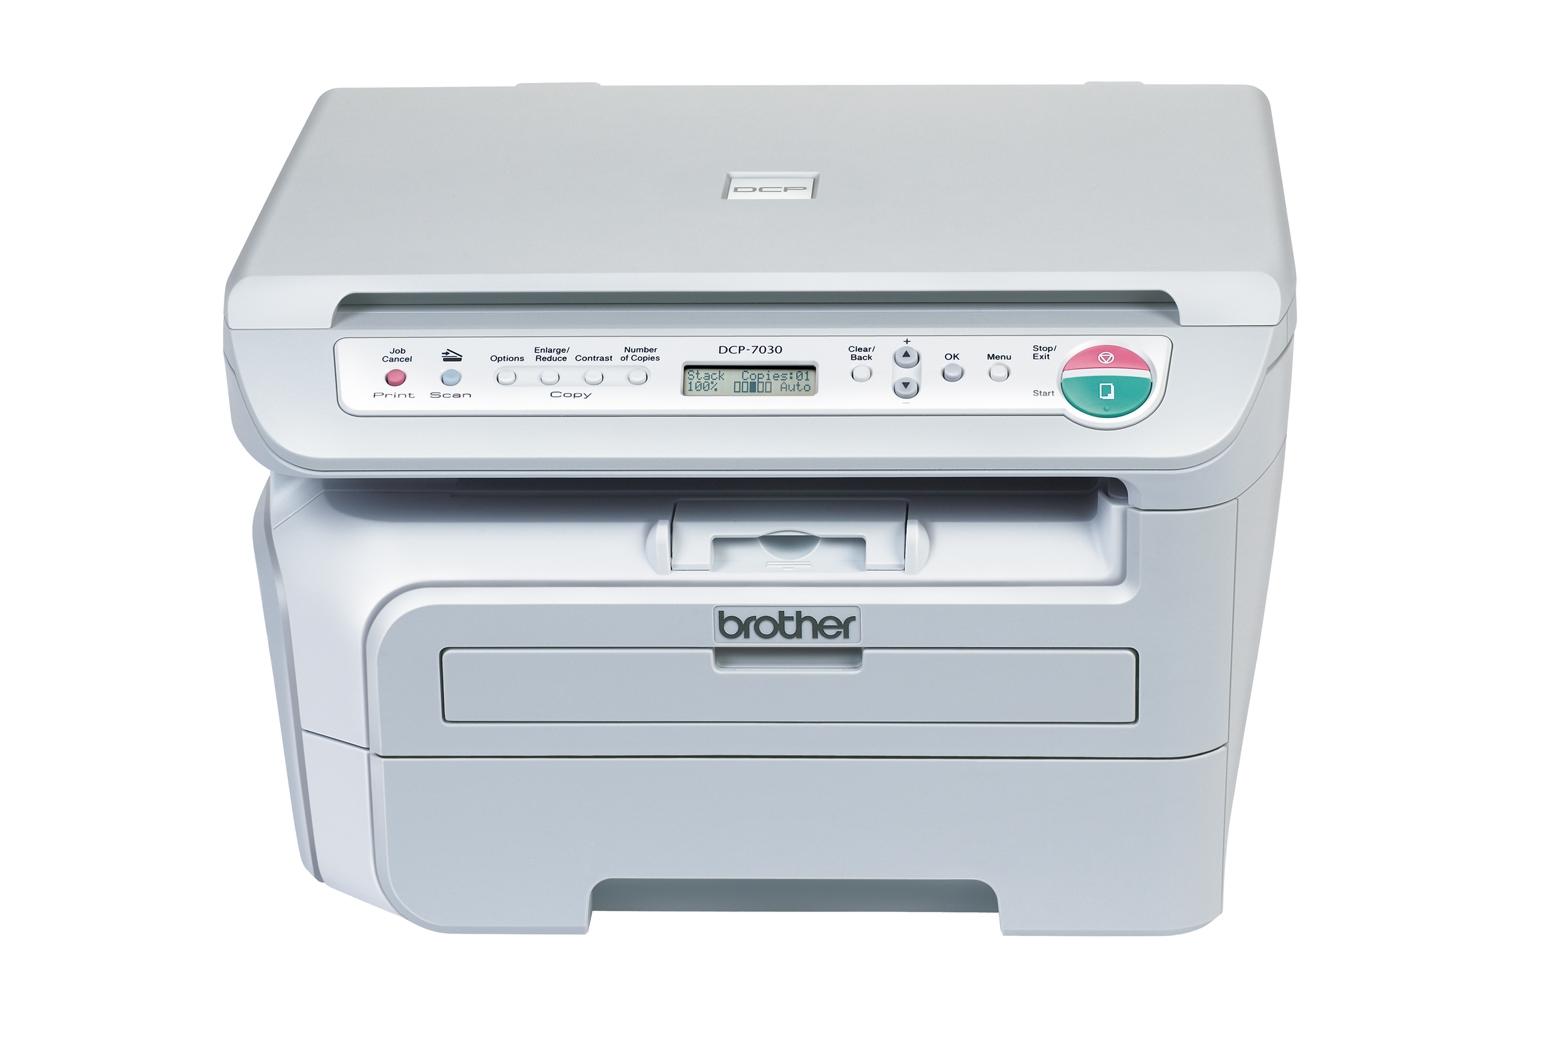 Принтер Brother DCP-7030